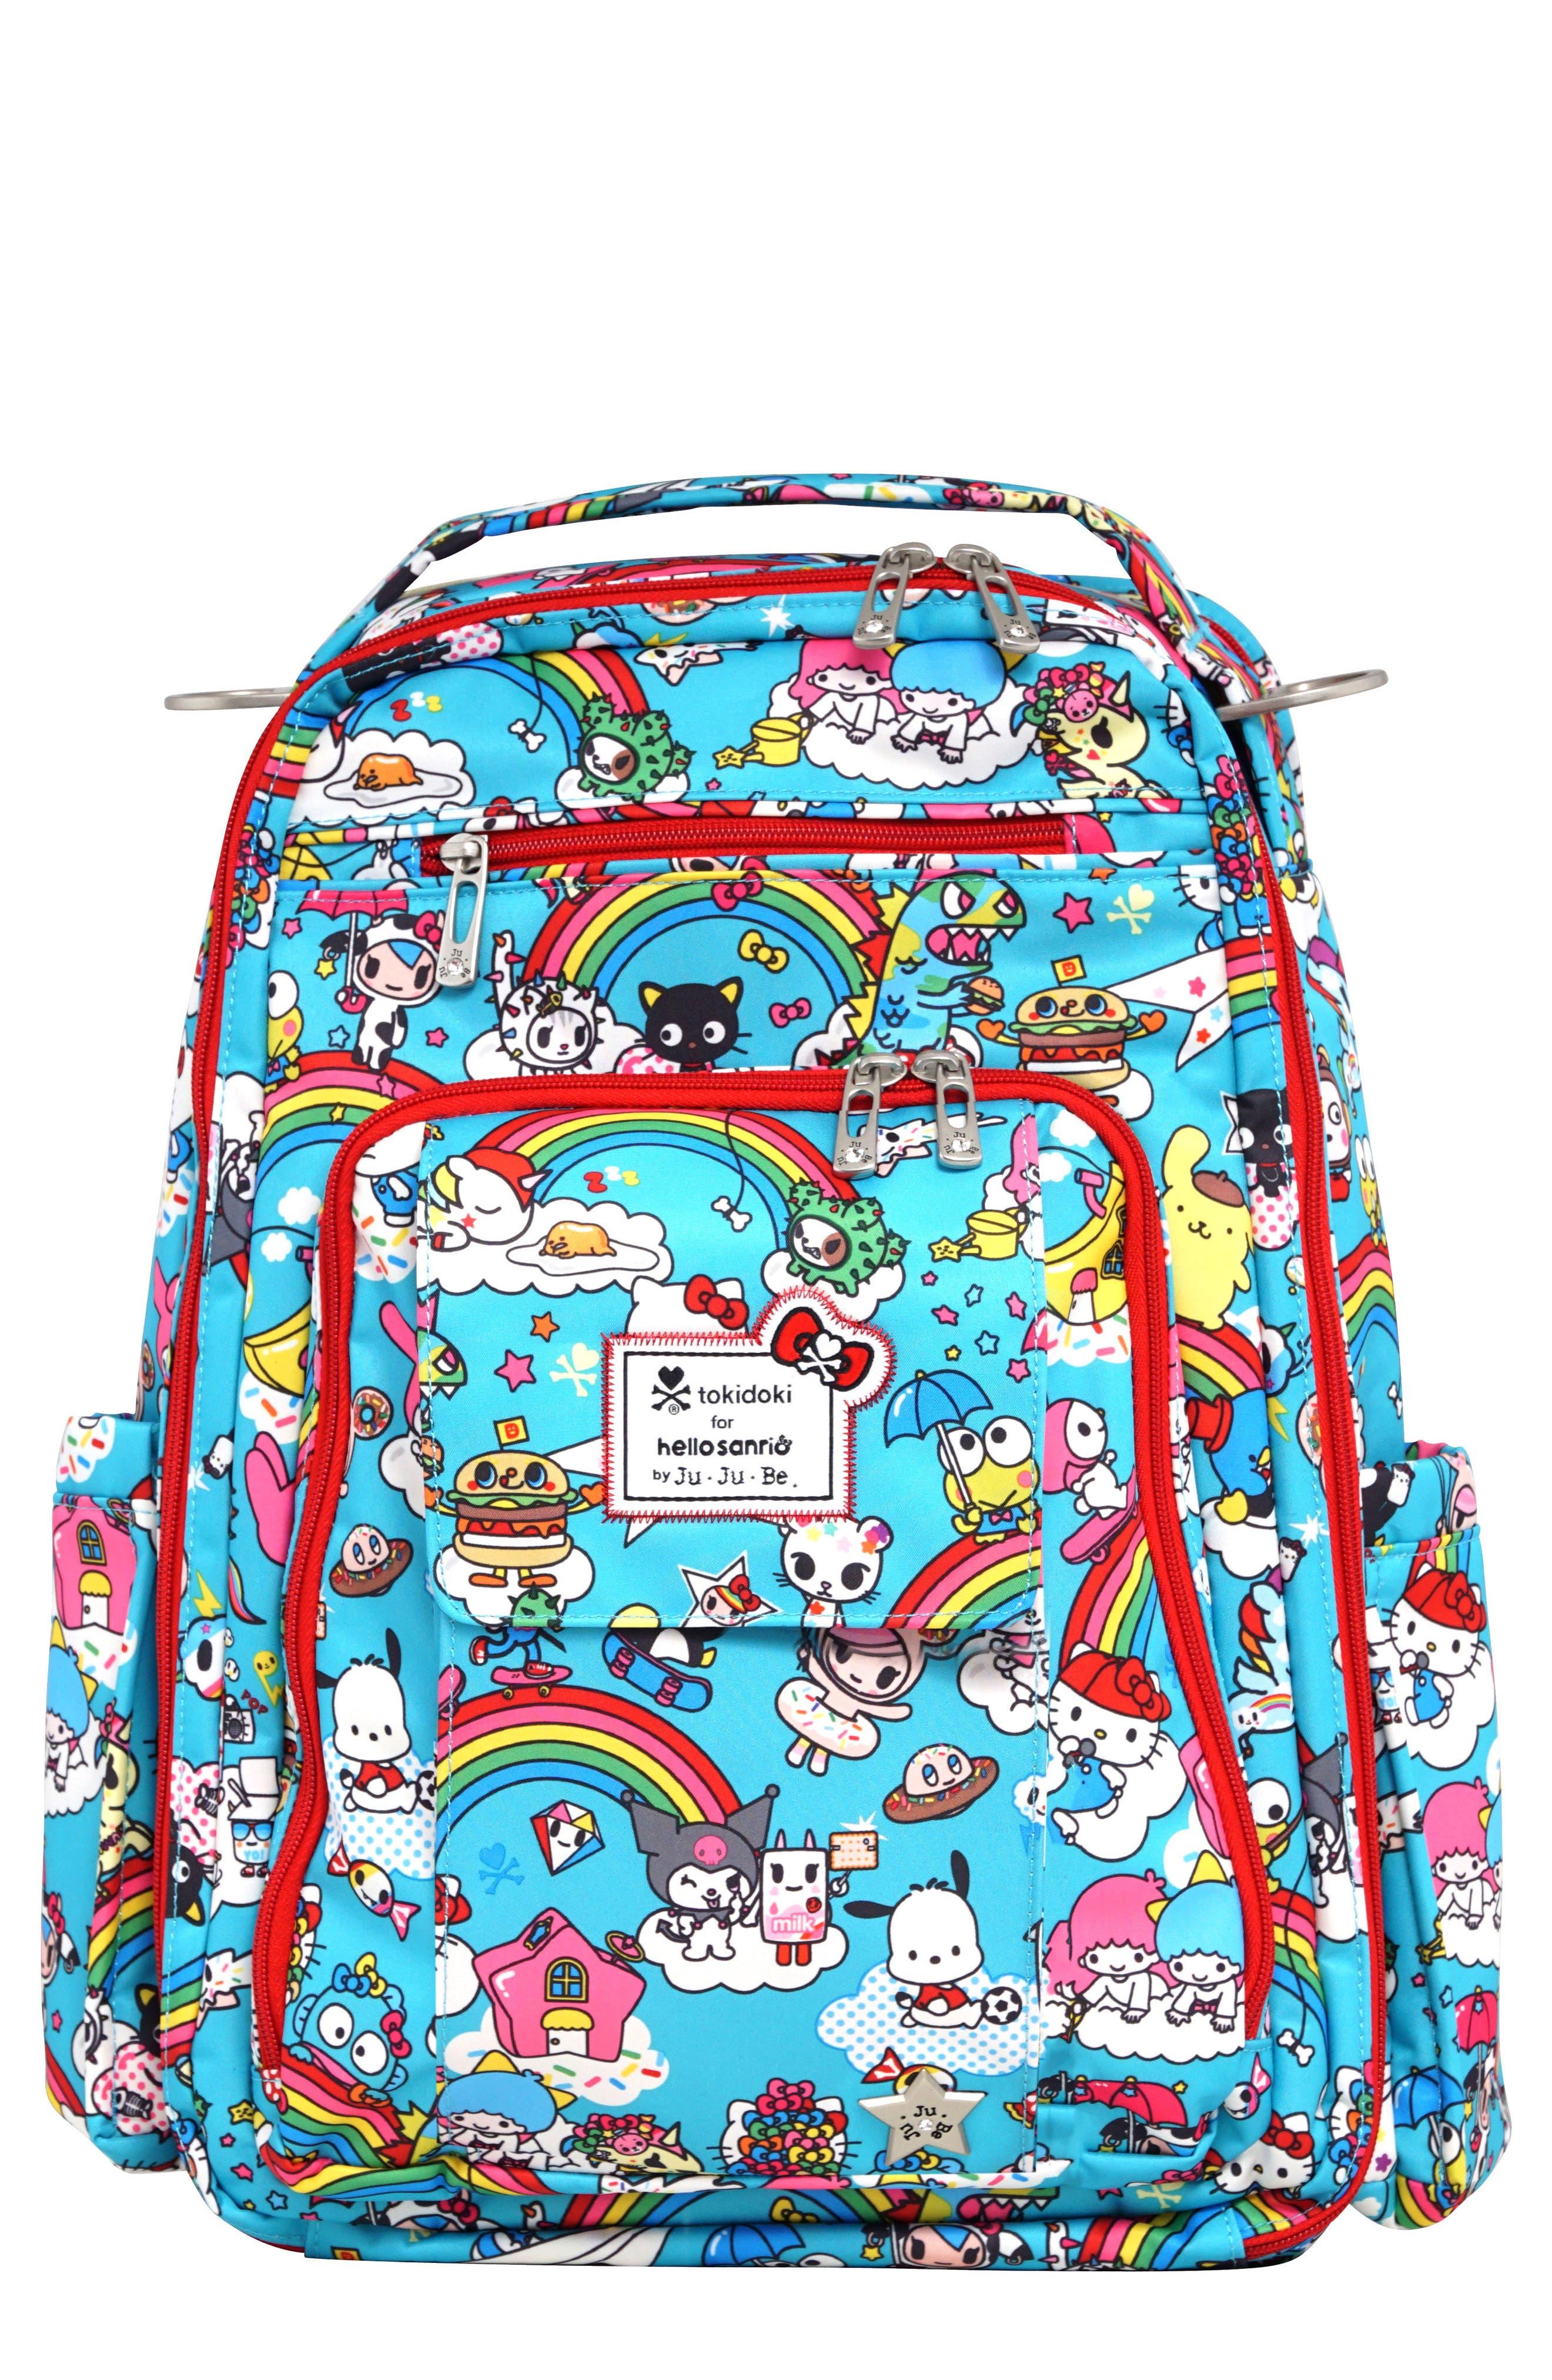 Ju-Ju-Be x tokidoki for Hello Sanrio Rainbow Dreams Be Right Back Diaper Backpack